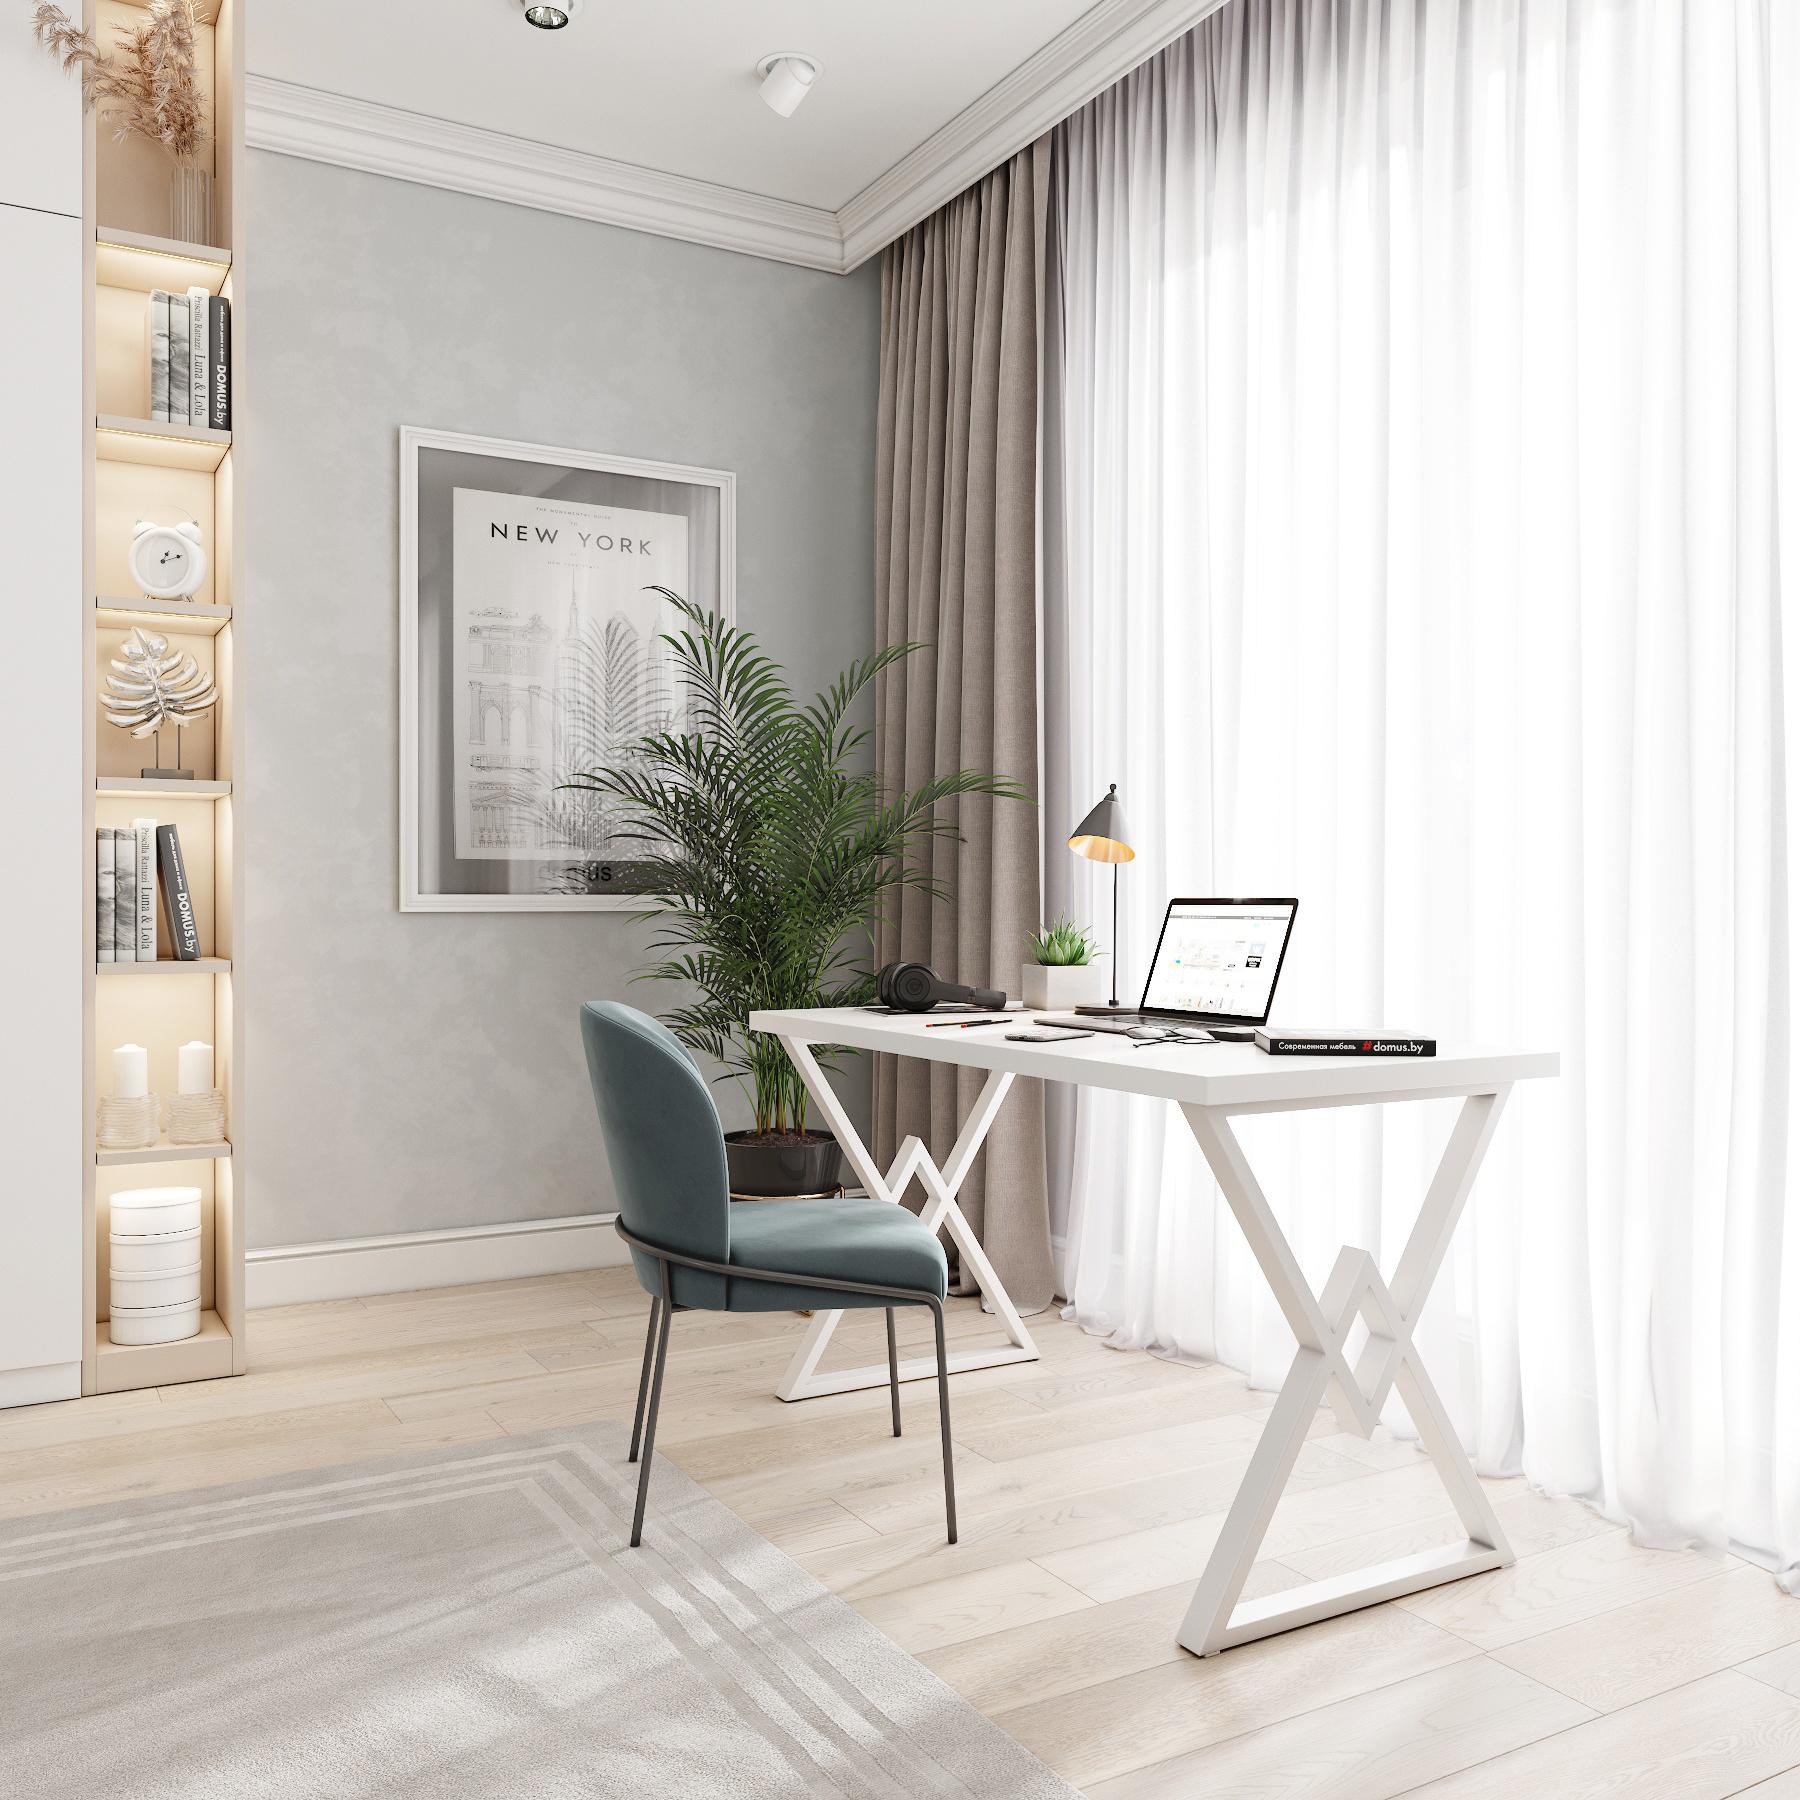 Письменный стол ДОМУС Аксиом белый/металл белый